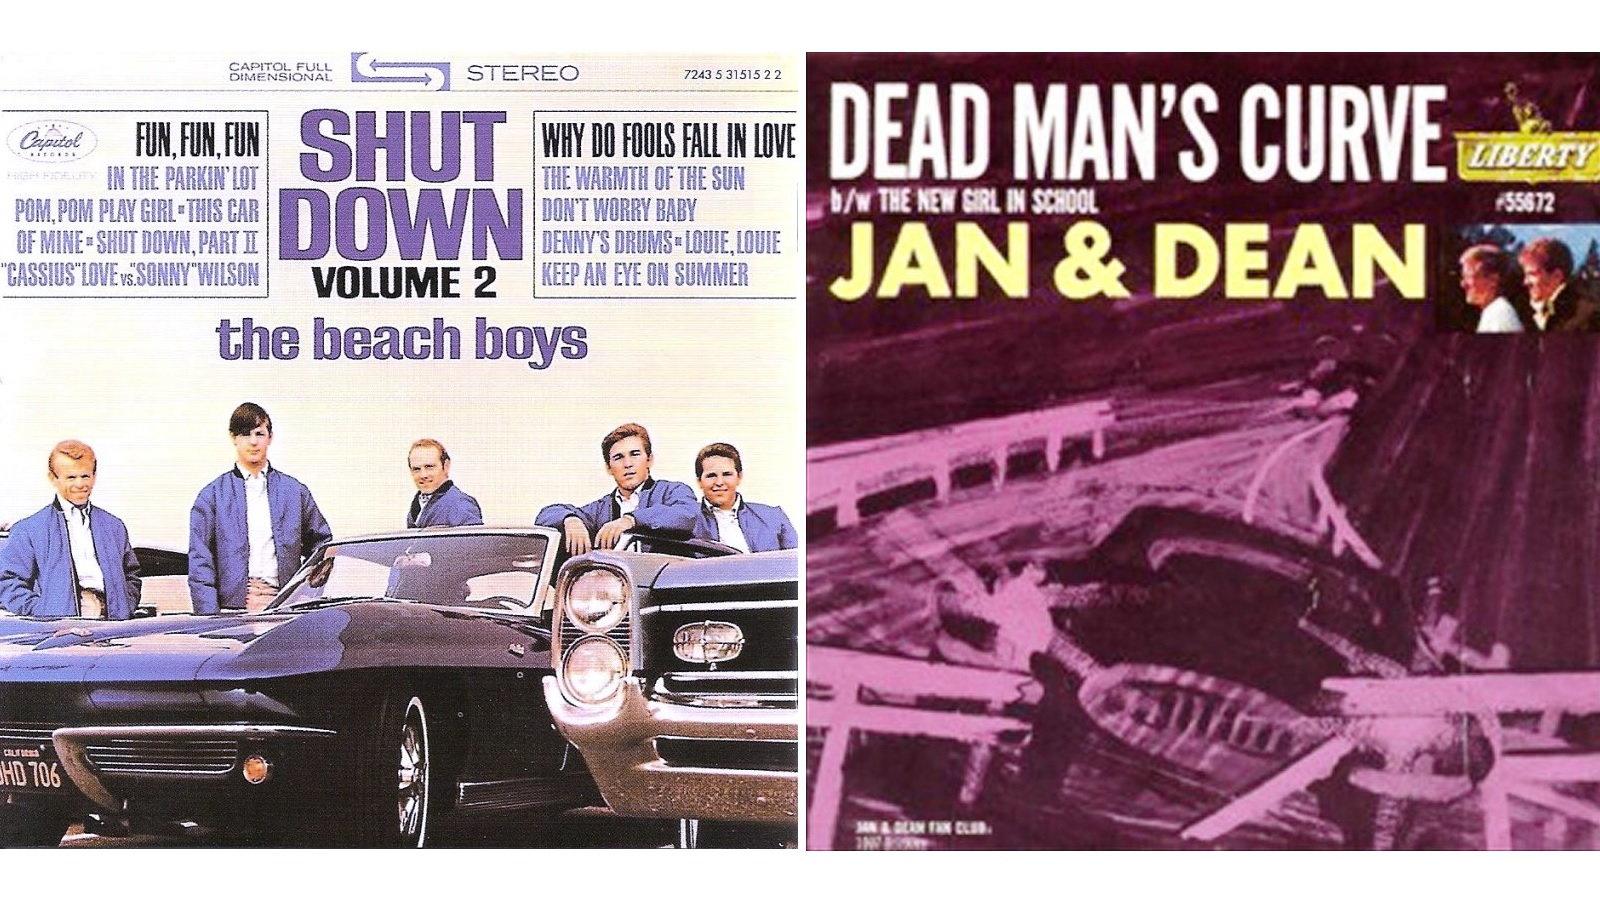 4. The Beach Boys, and Jan & Dean